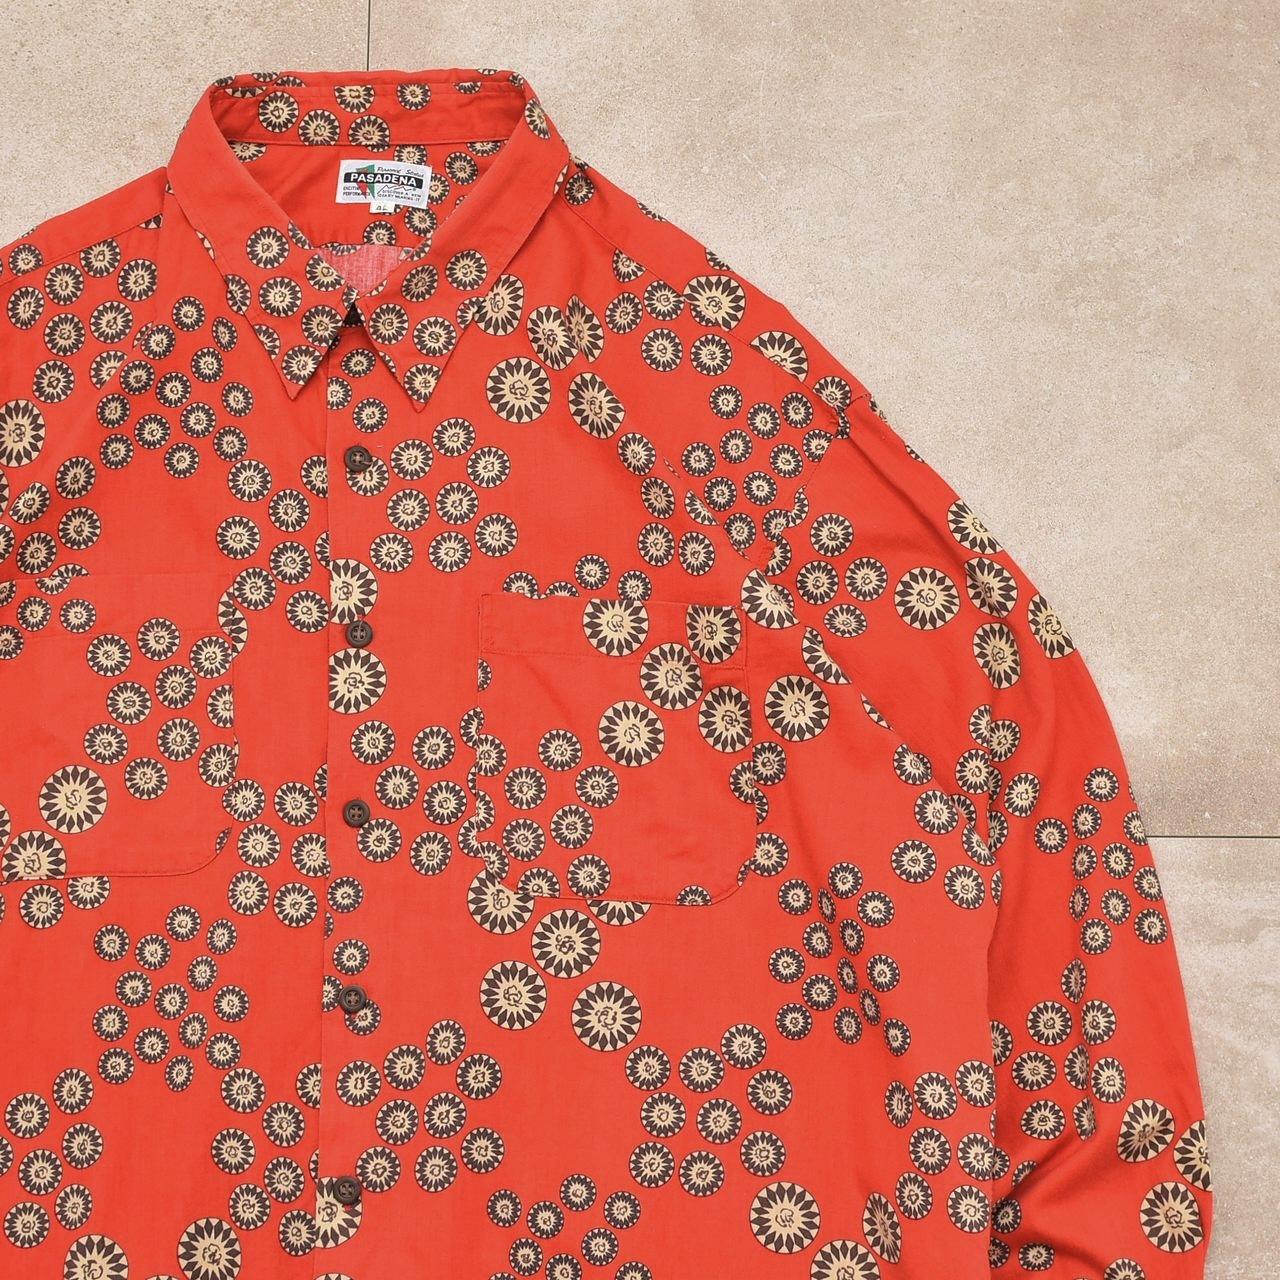 Geometric dot full pattern cotton shirt